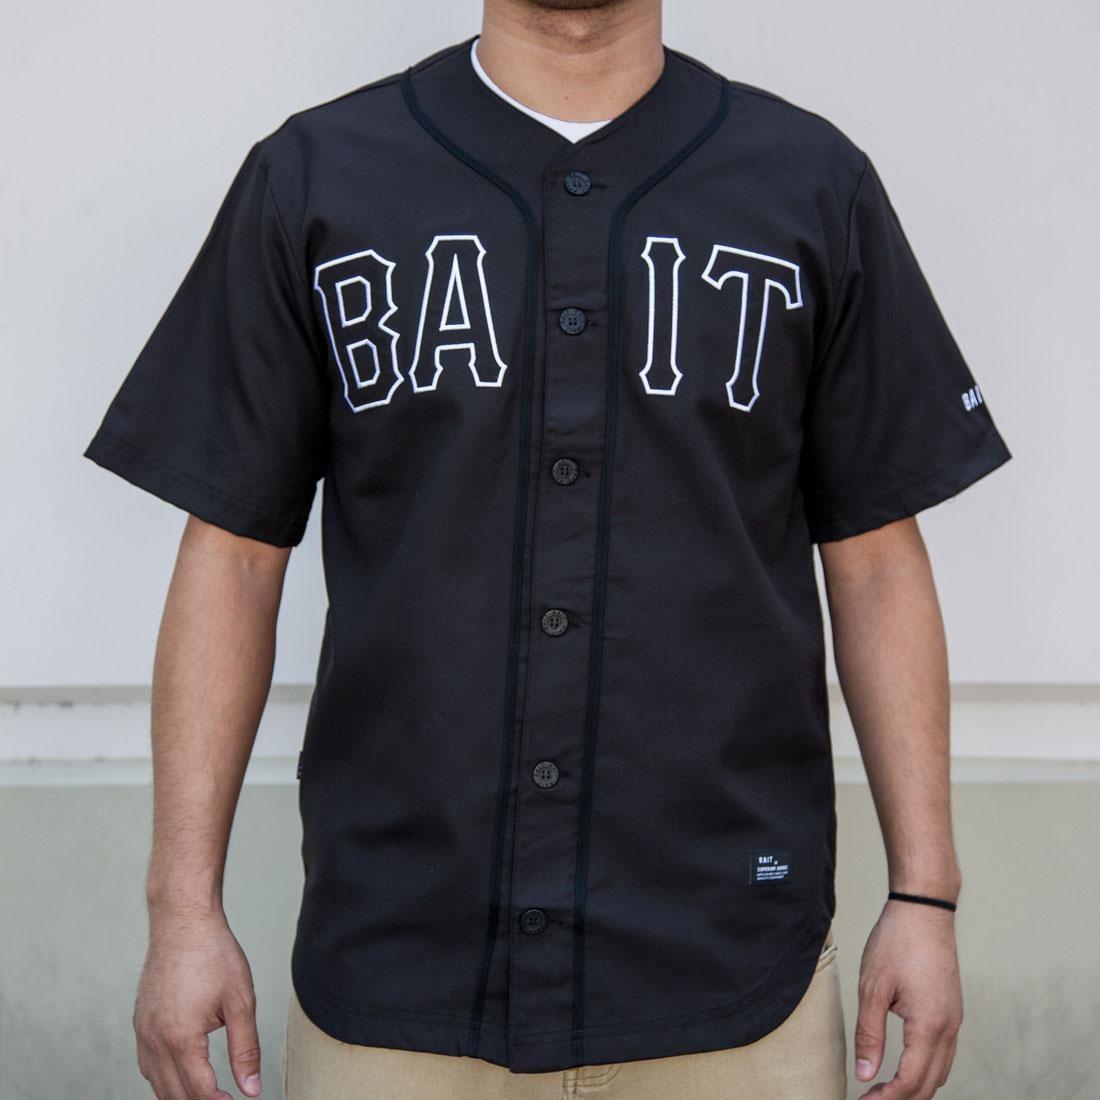 BAIT Men Sluggers Baseball Jersey (black / black / white)